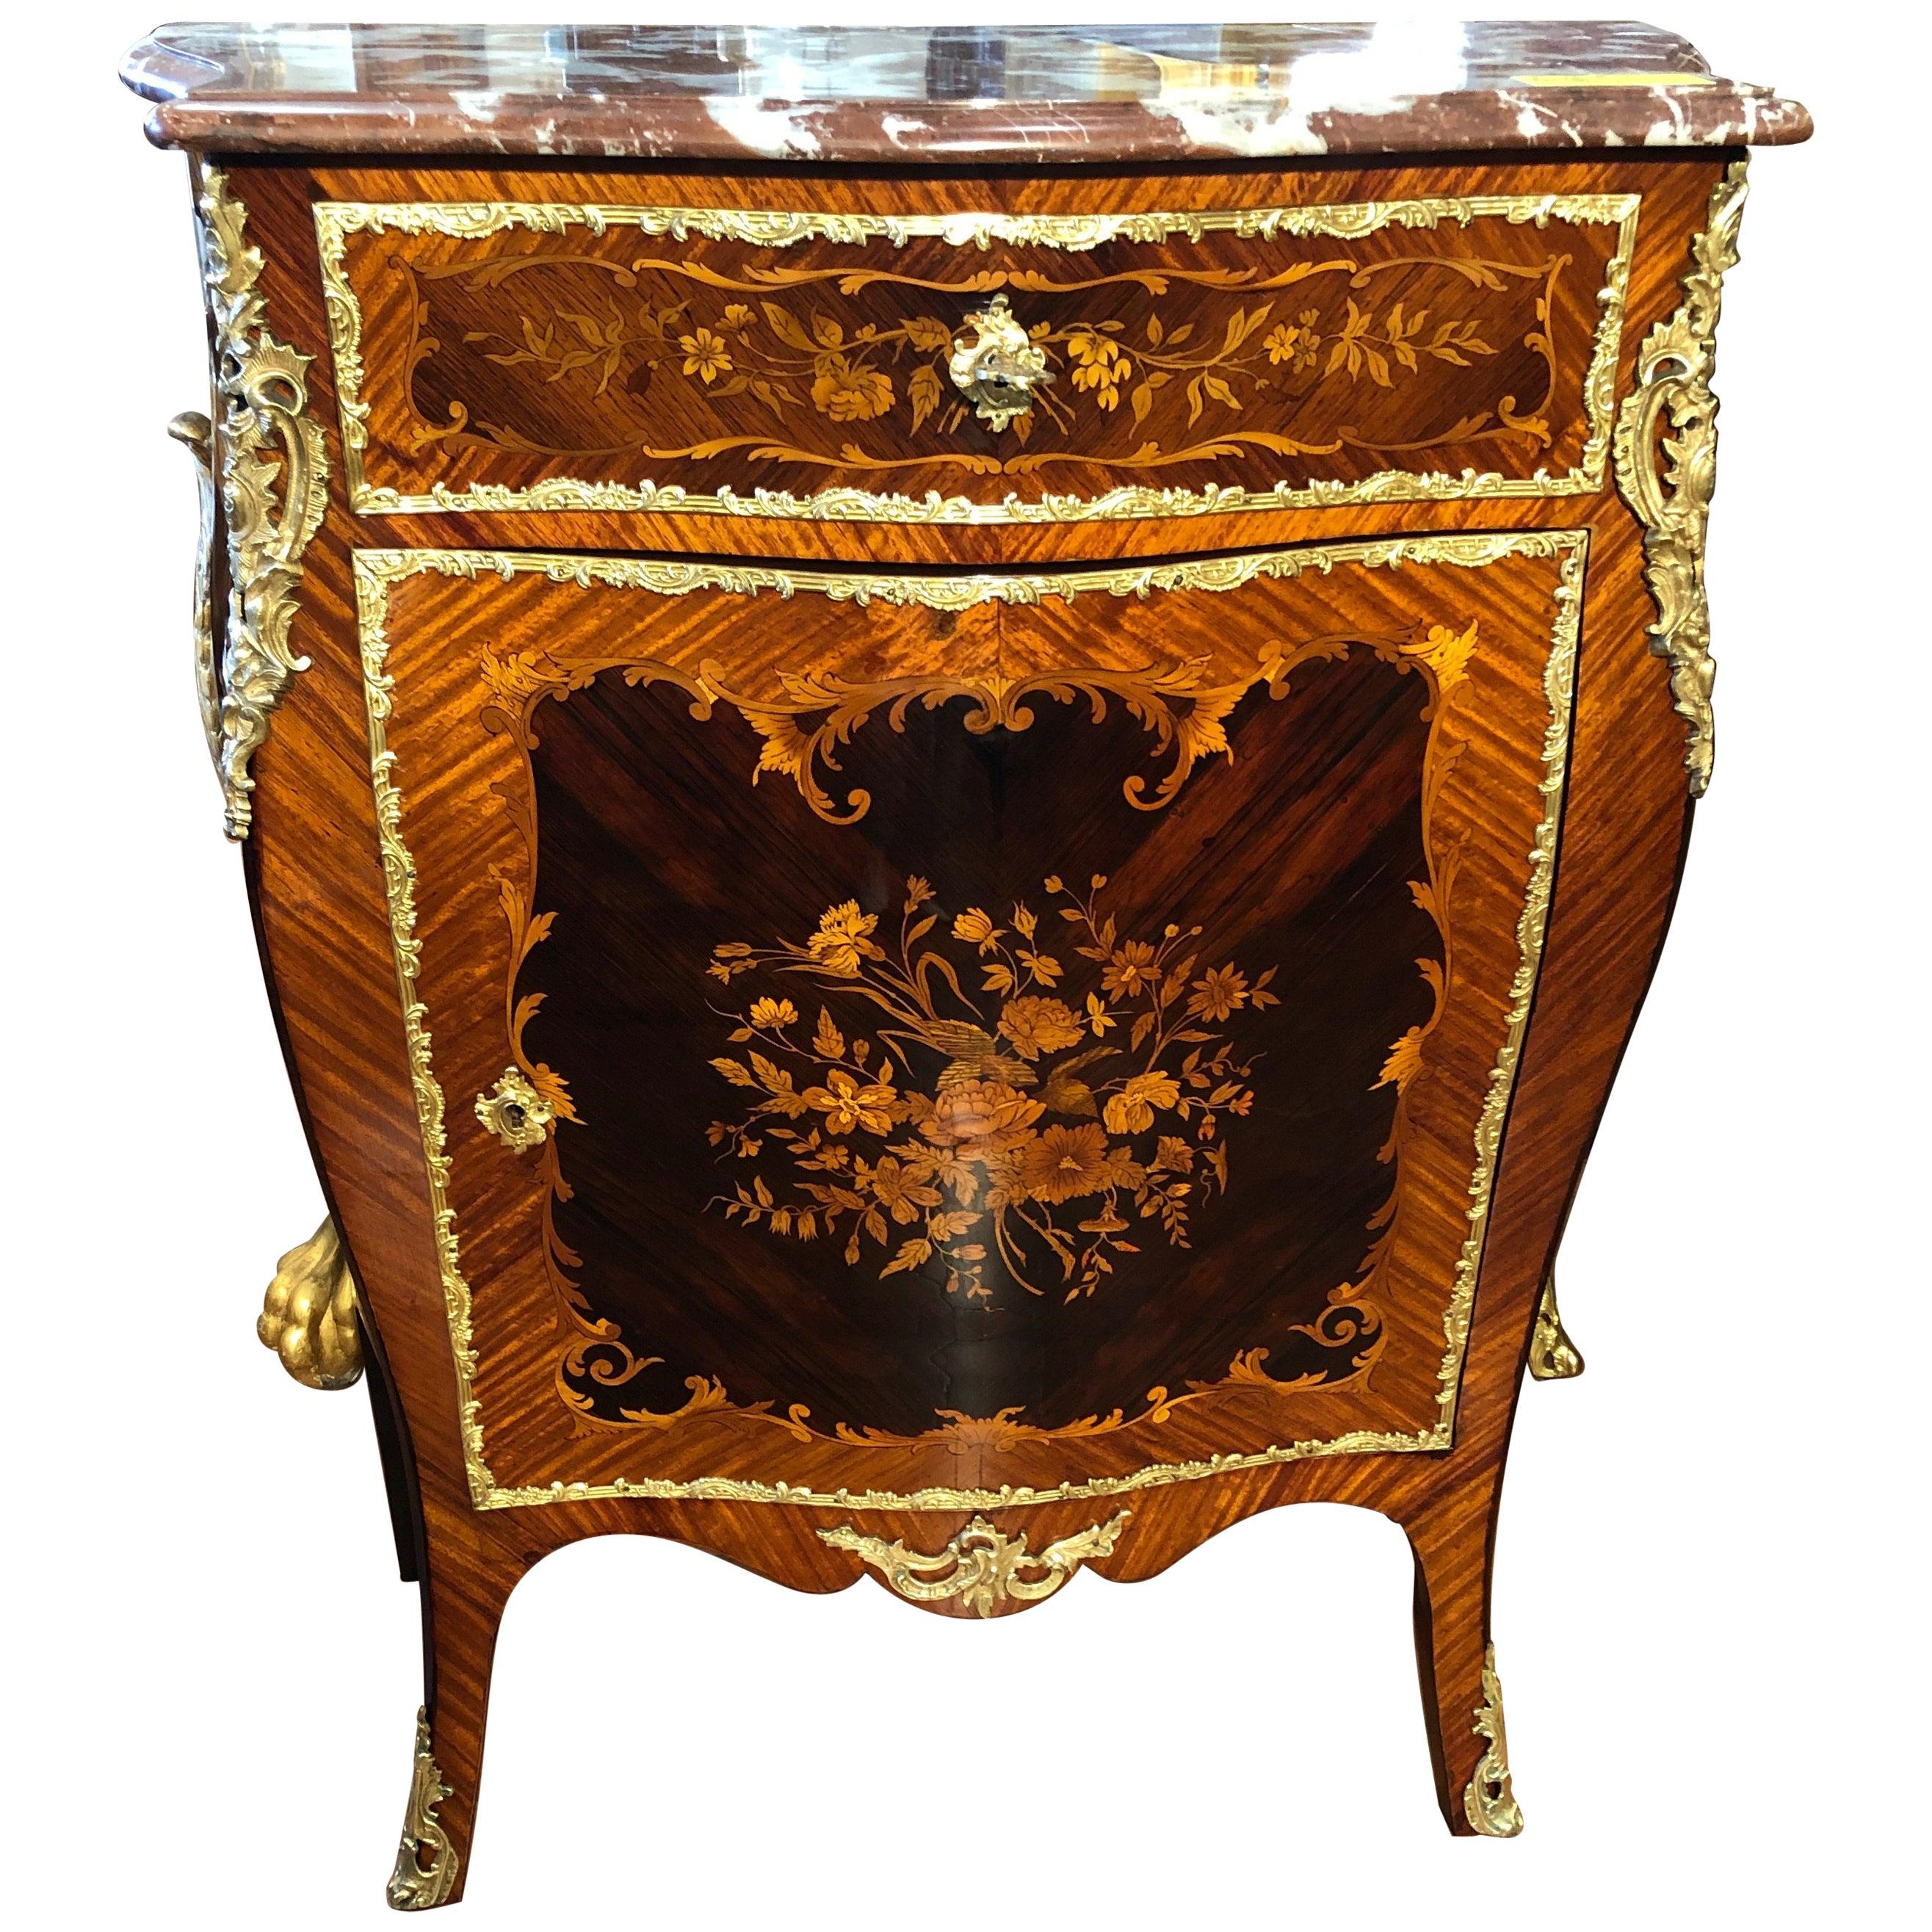 19th Century Napoleon III Rosewood Marble Cabinet Credenzas 1890